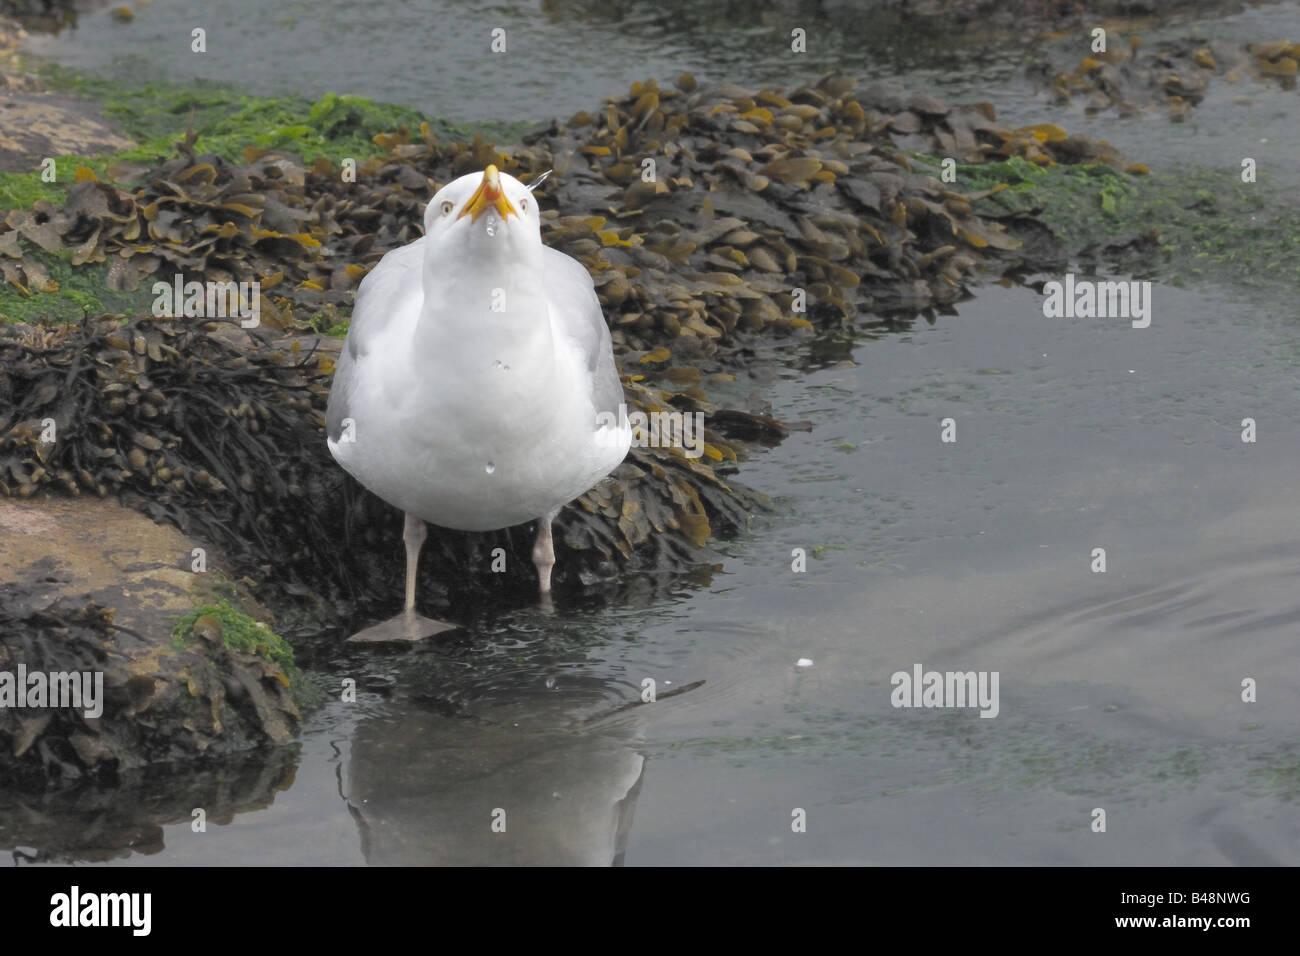 Larus argentatus gabbiano reale laridae gocce d'acqua waterdrops battigia England UK united kingdom Seahouses - Stock Image